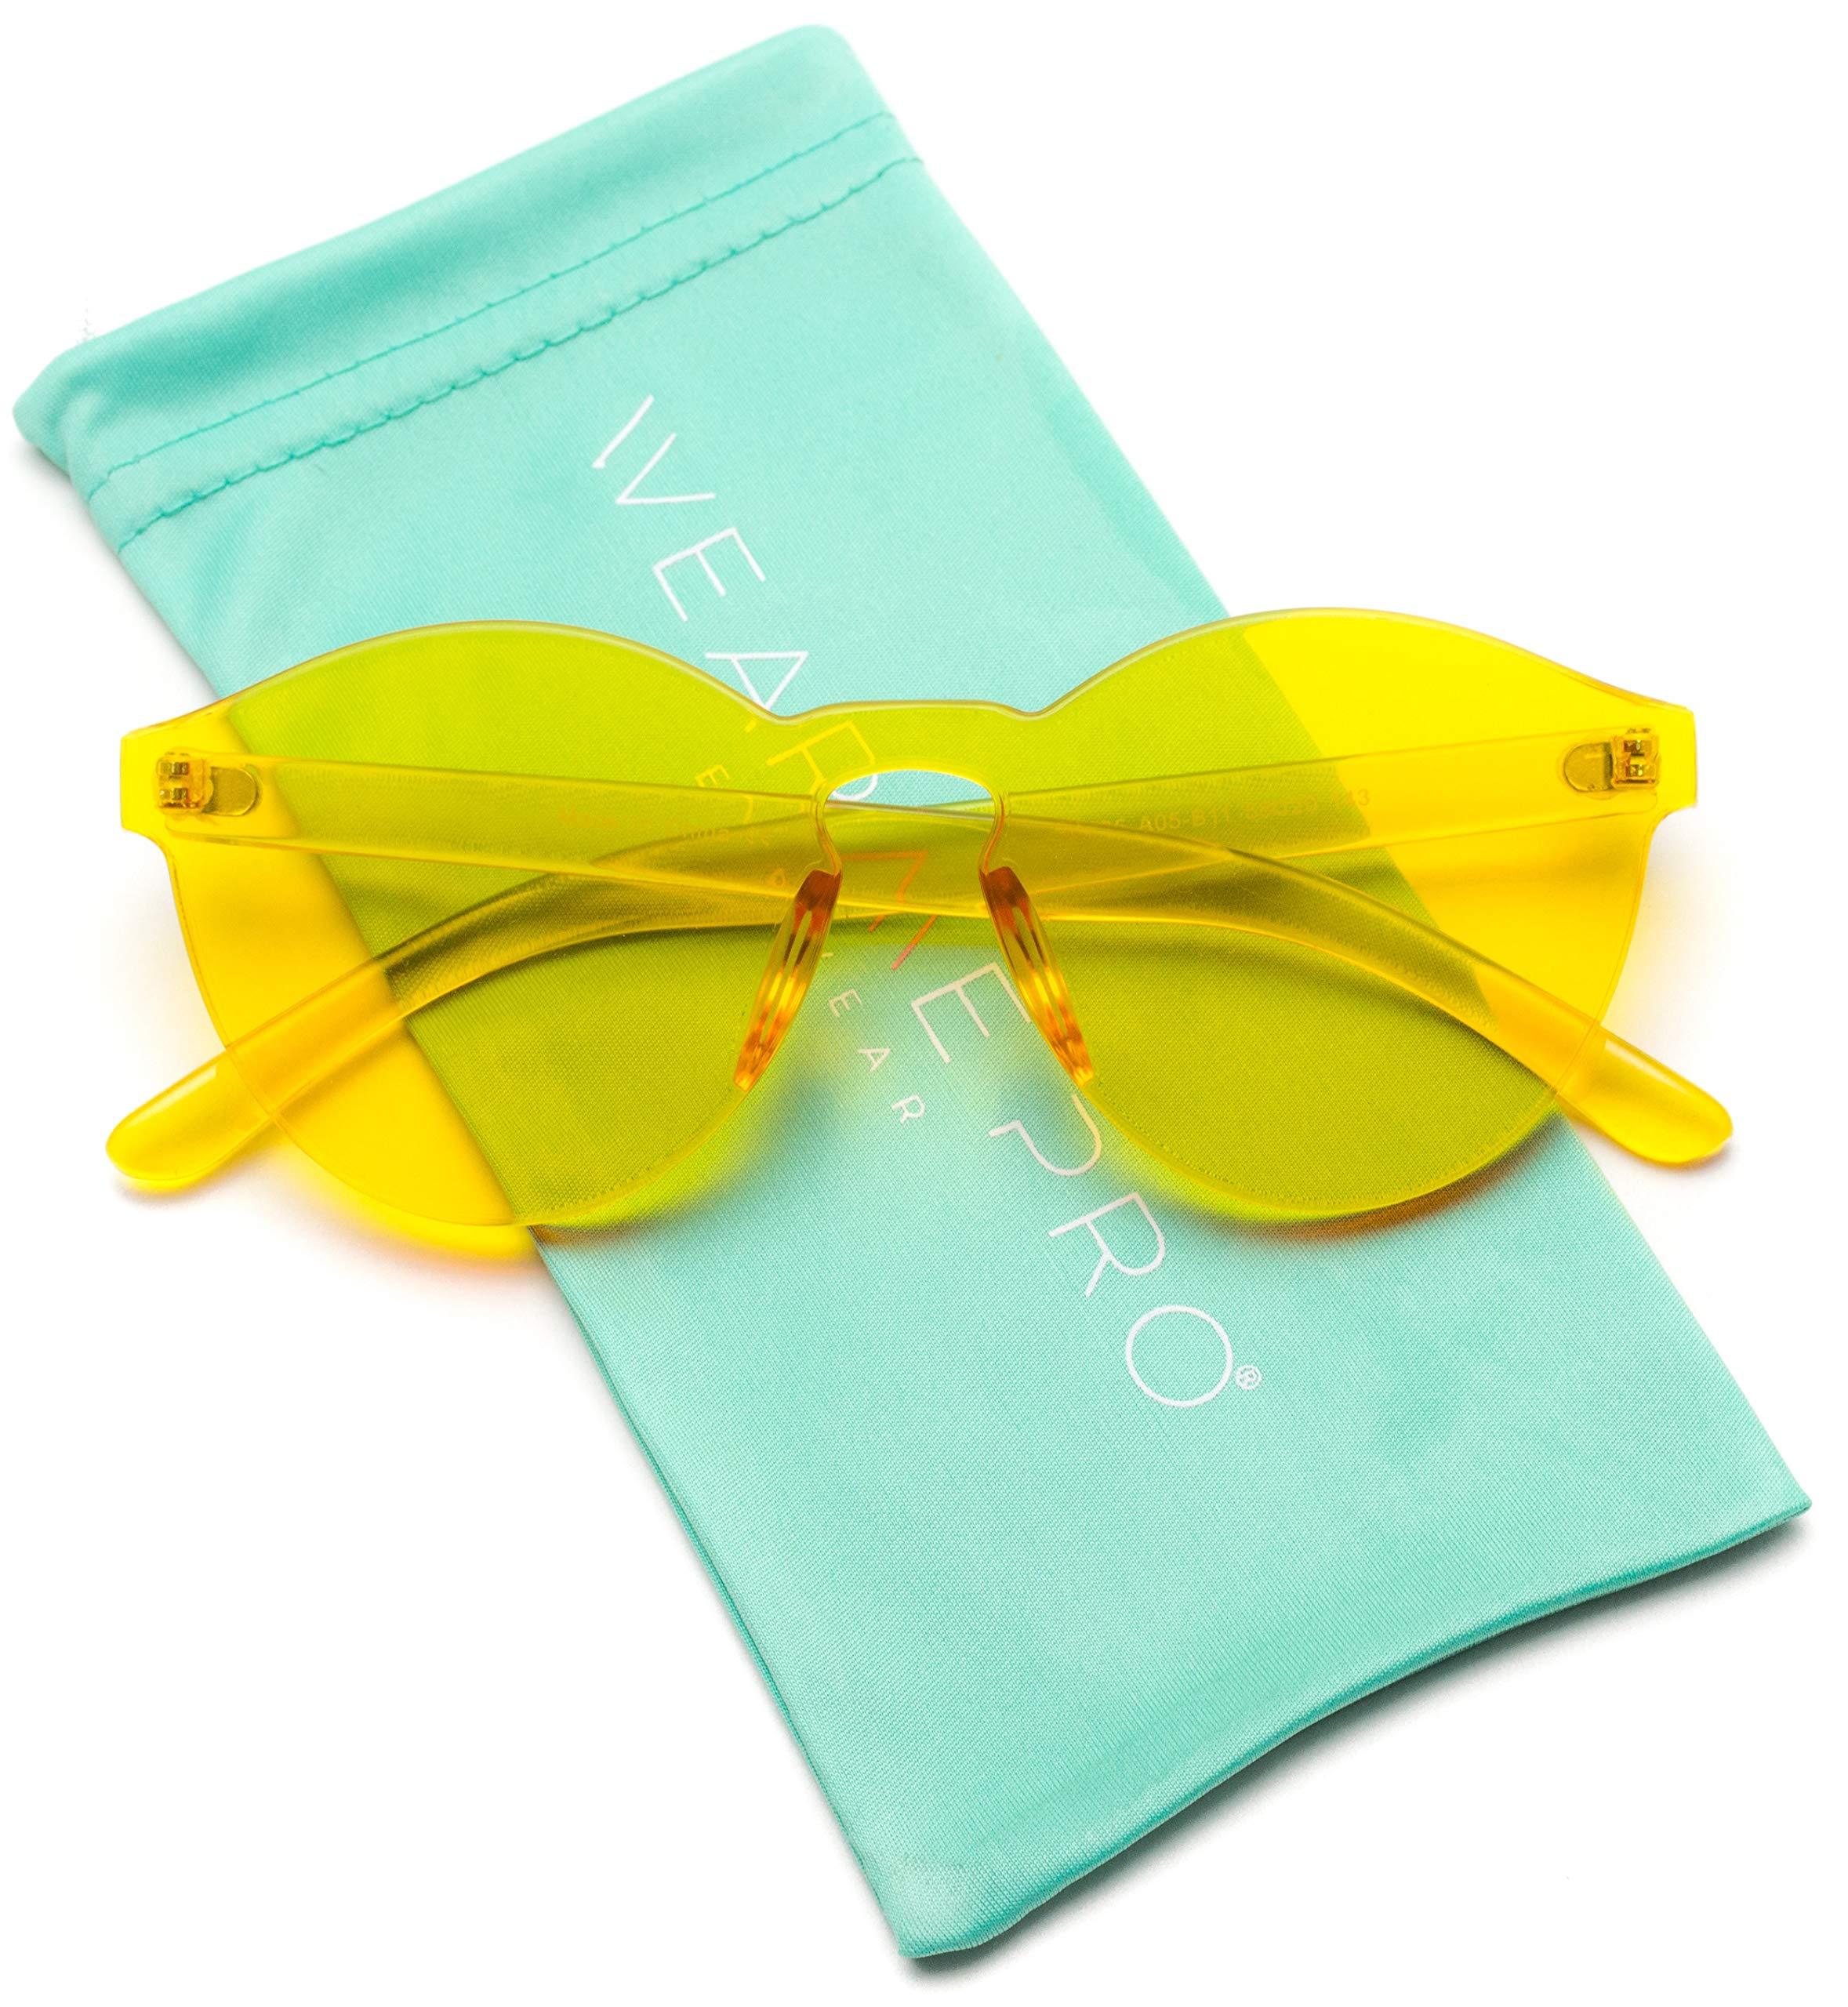 7a5e55d871f Galleon - WearMe Pro - Colorful One Piece Transparent Round Super Retro  Sunglasses